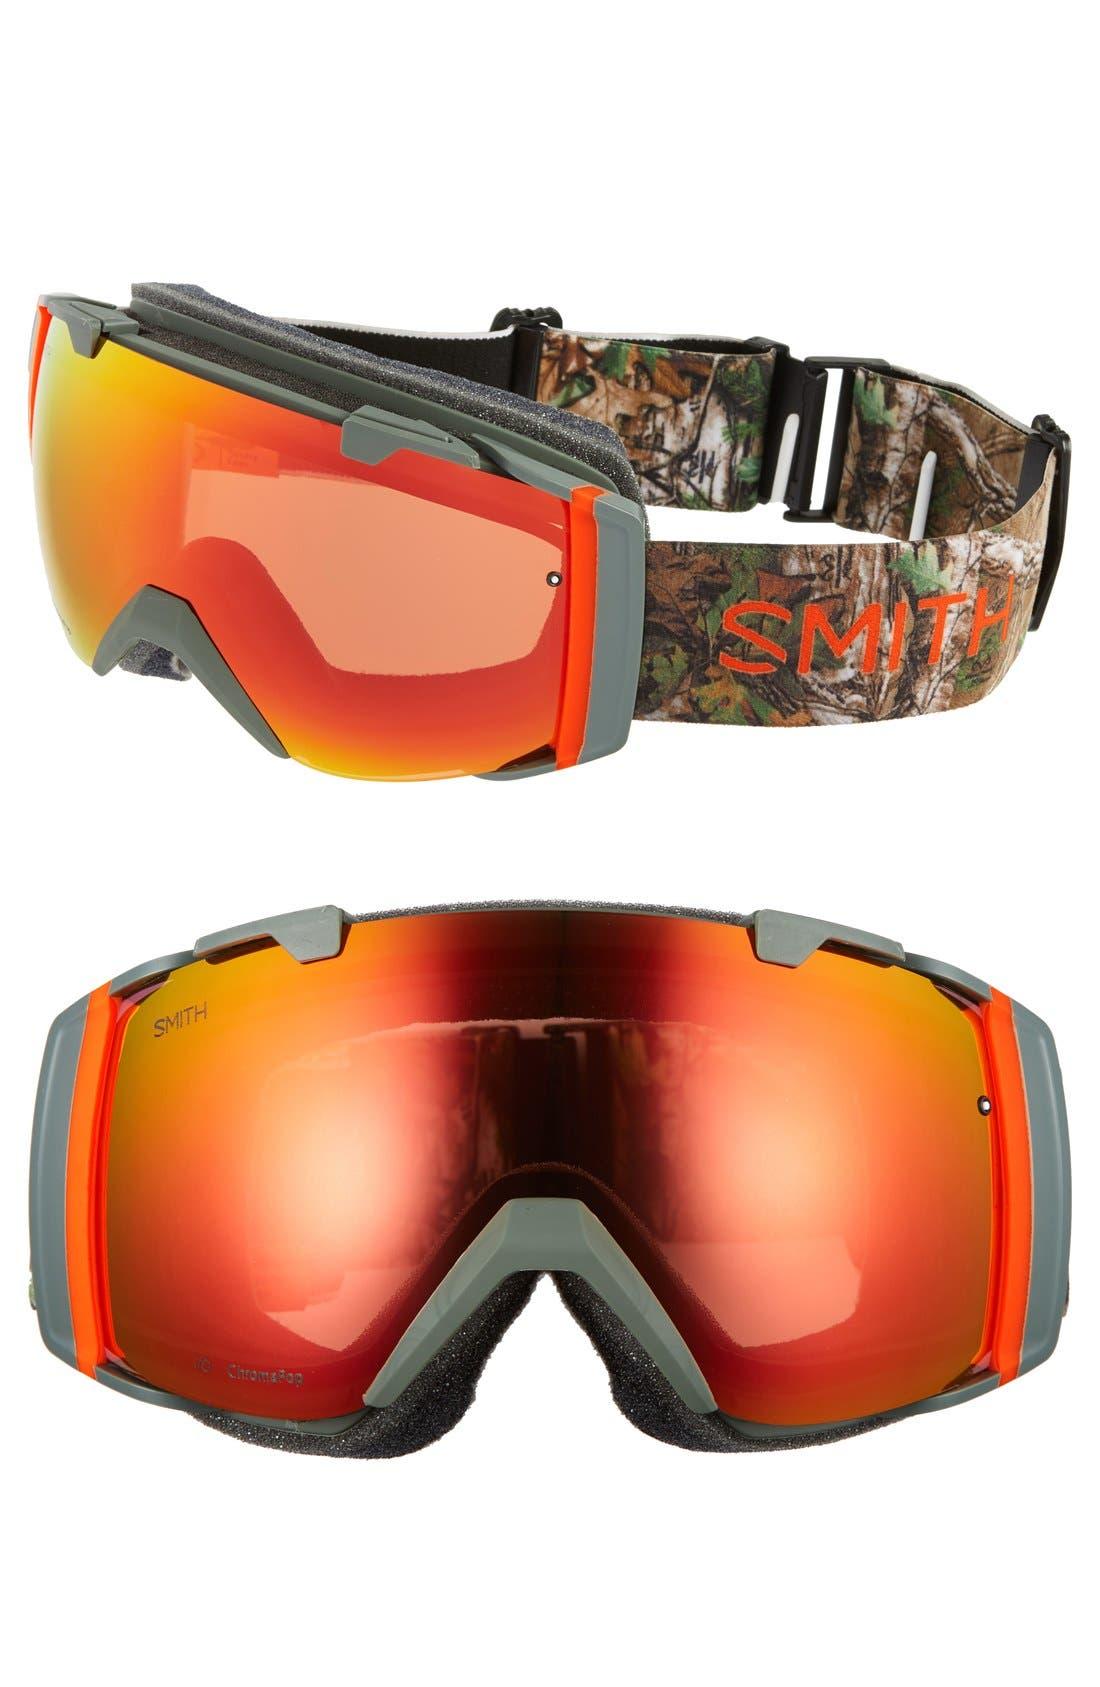 Smith I/O 205mm Snow Goggles